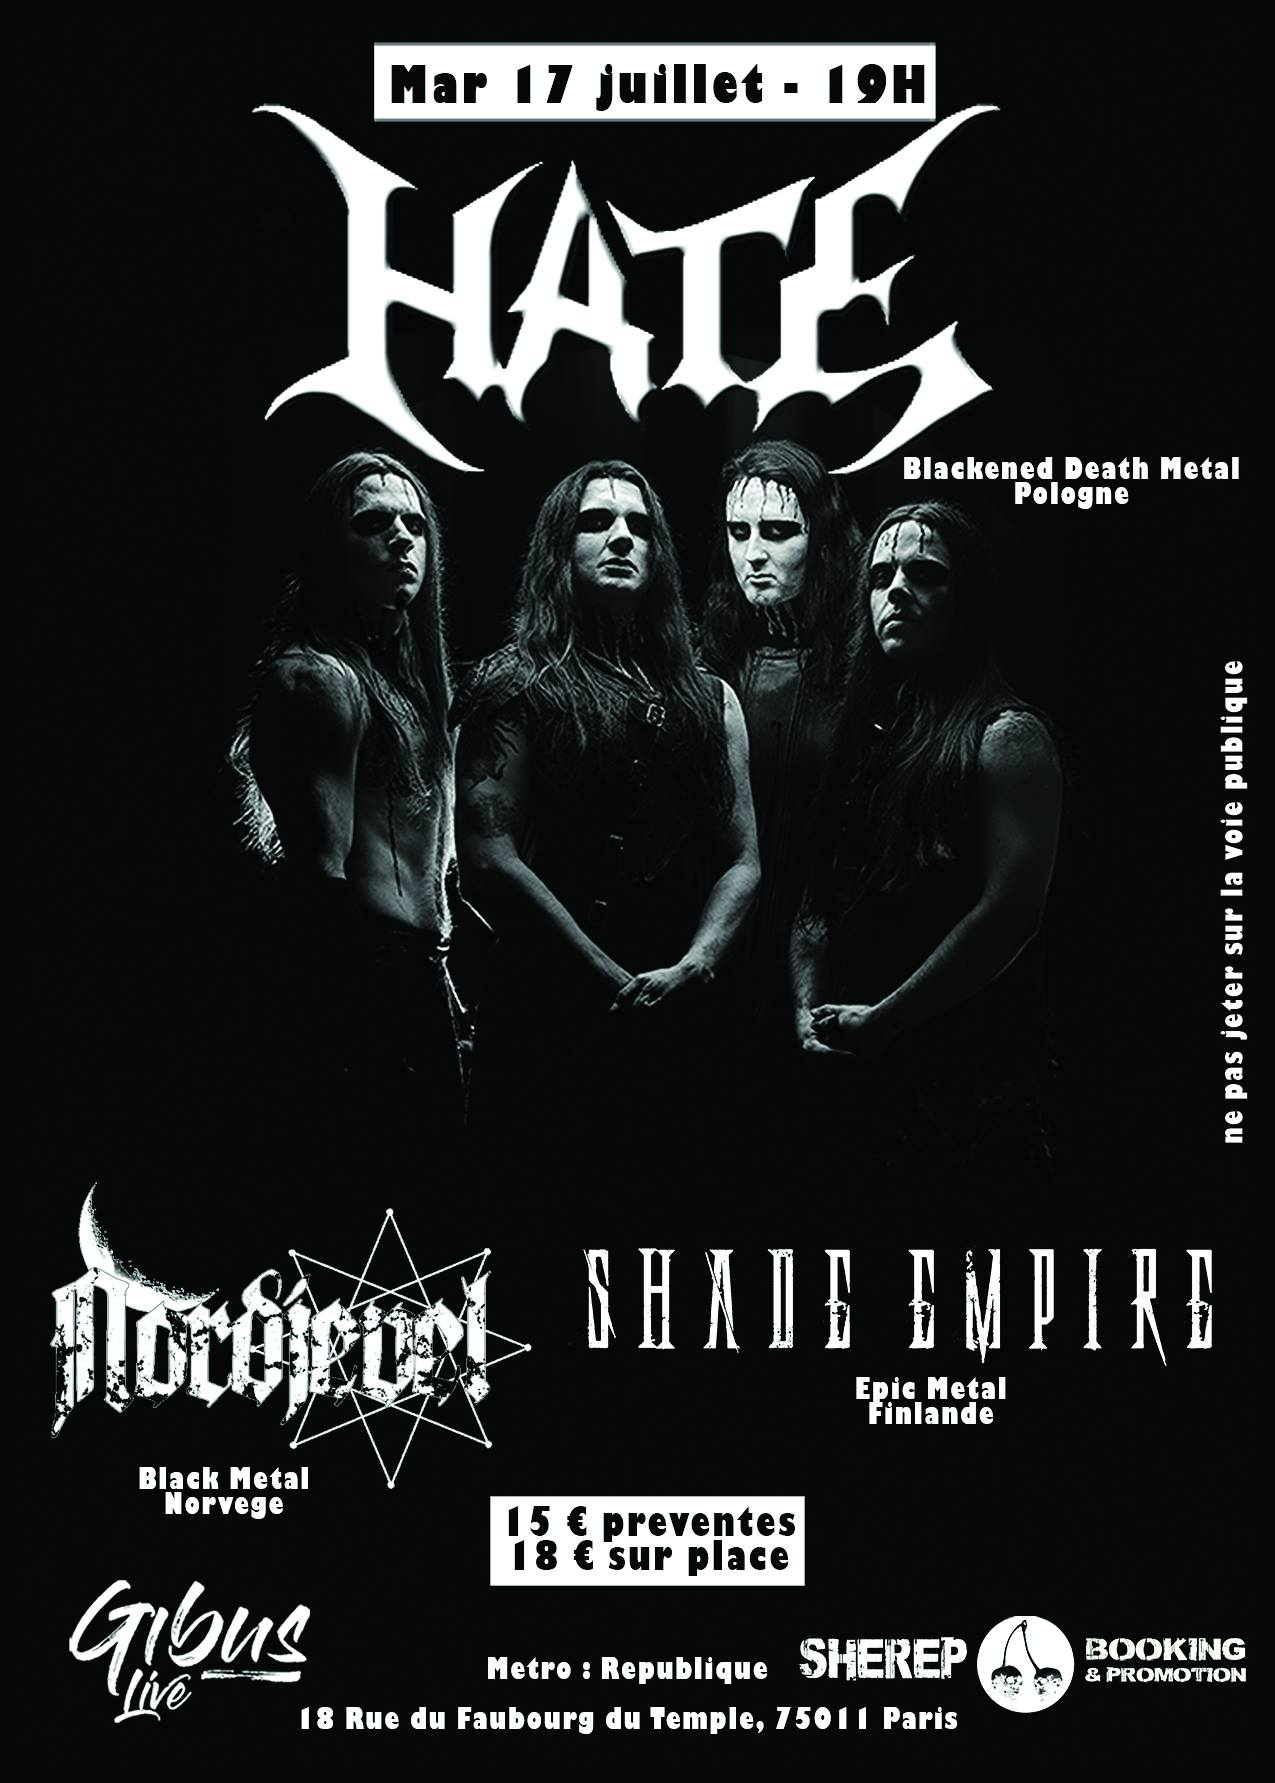 Hate / Shade Empire / Nordjevel – Paris